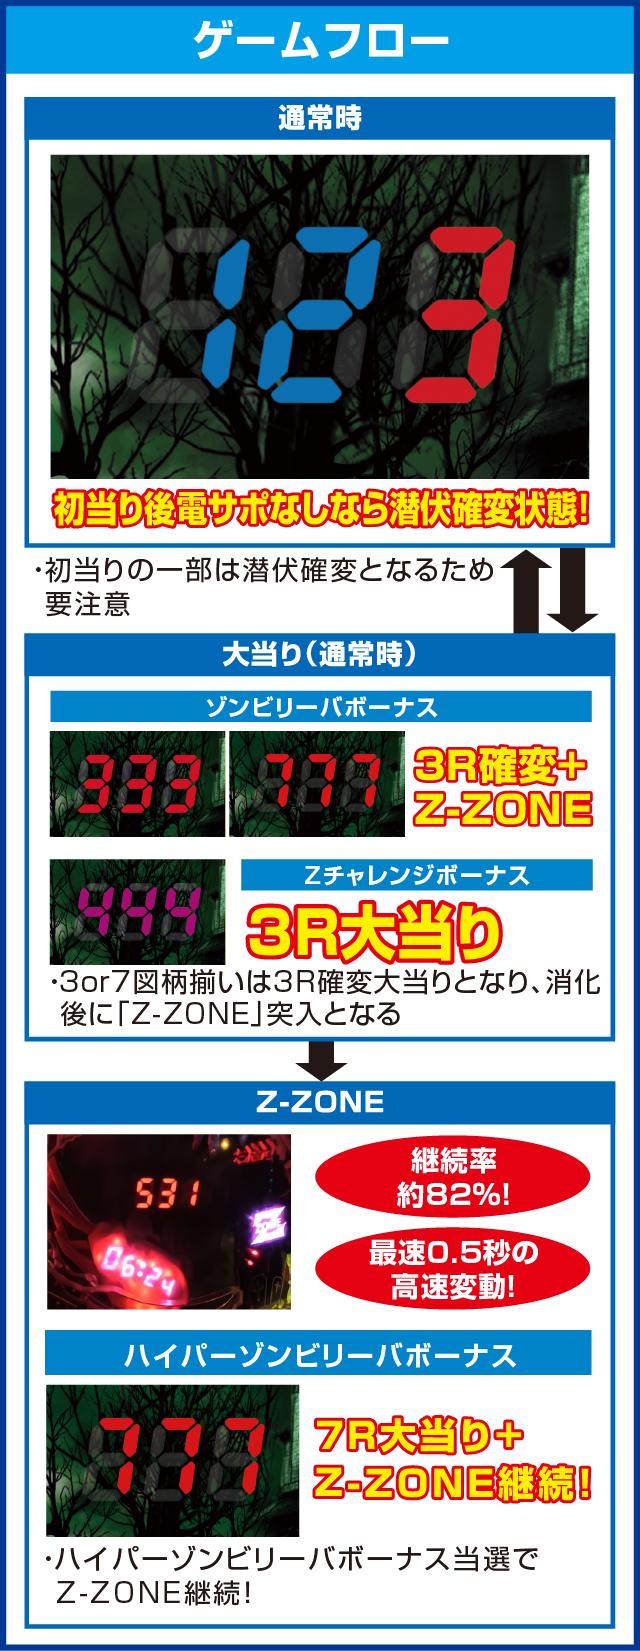 PゾンビリーバボーS4-T6のピックアップポイント